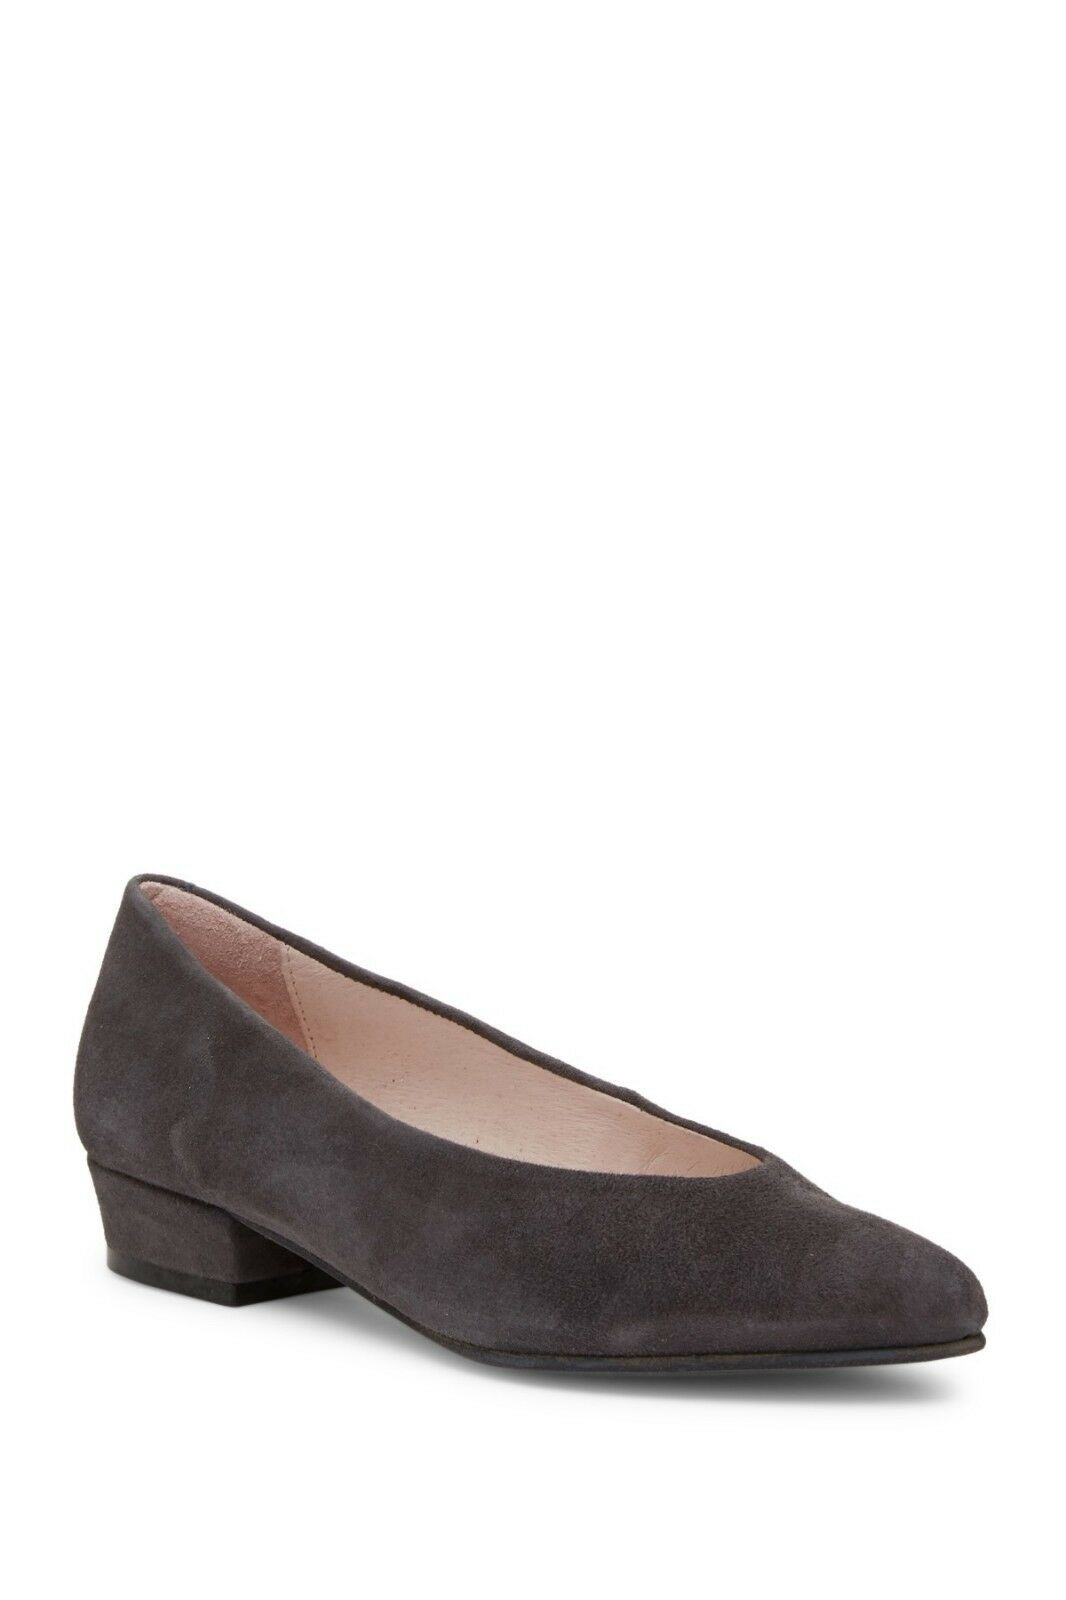 205 NWT Patricia Green Sz 9.5 Sandra Suede Pump Block Heel Comfort Schuhes GRAY